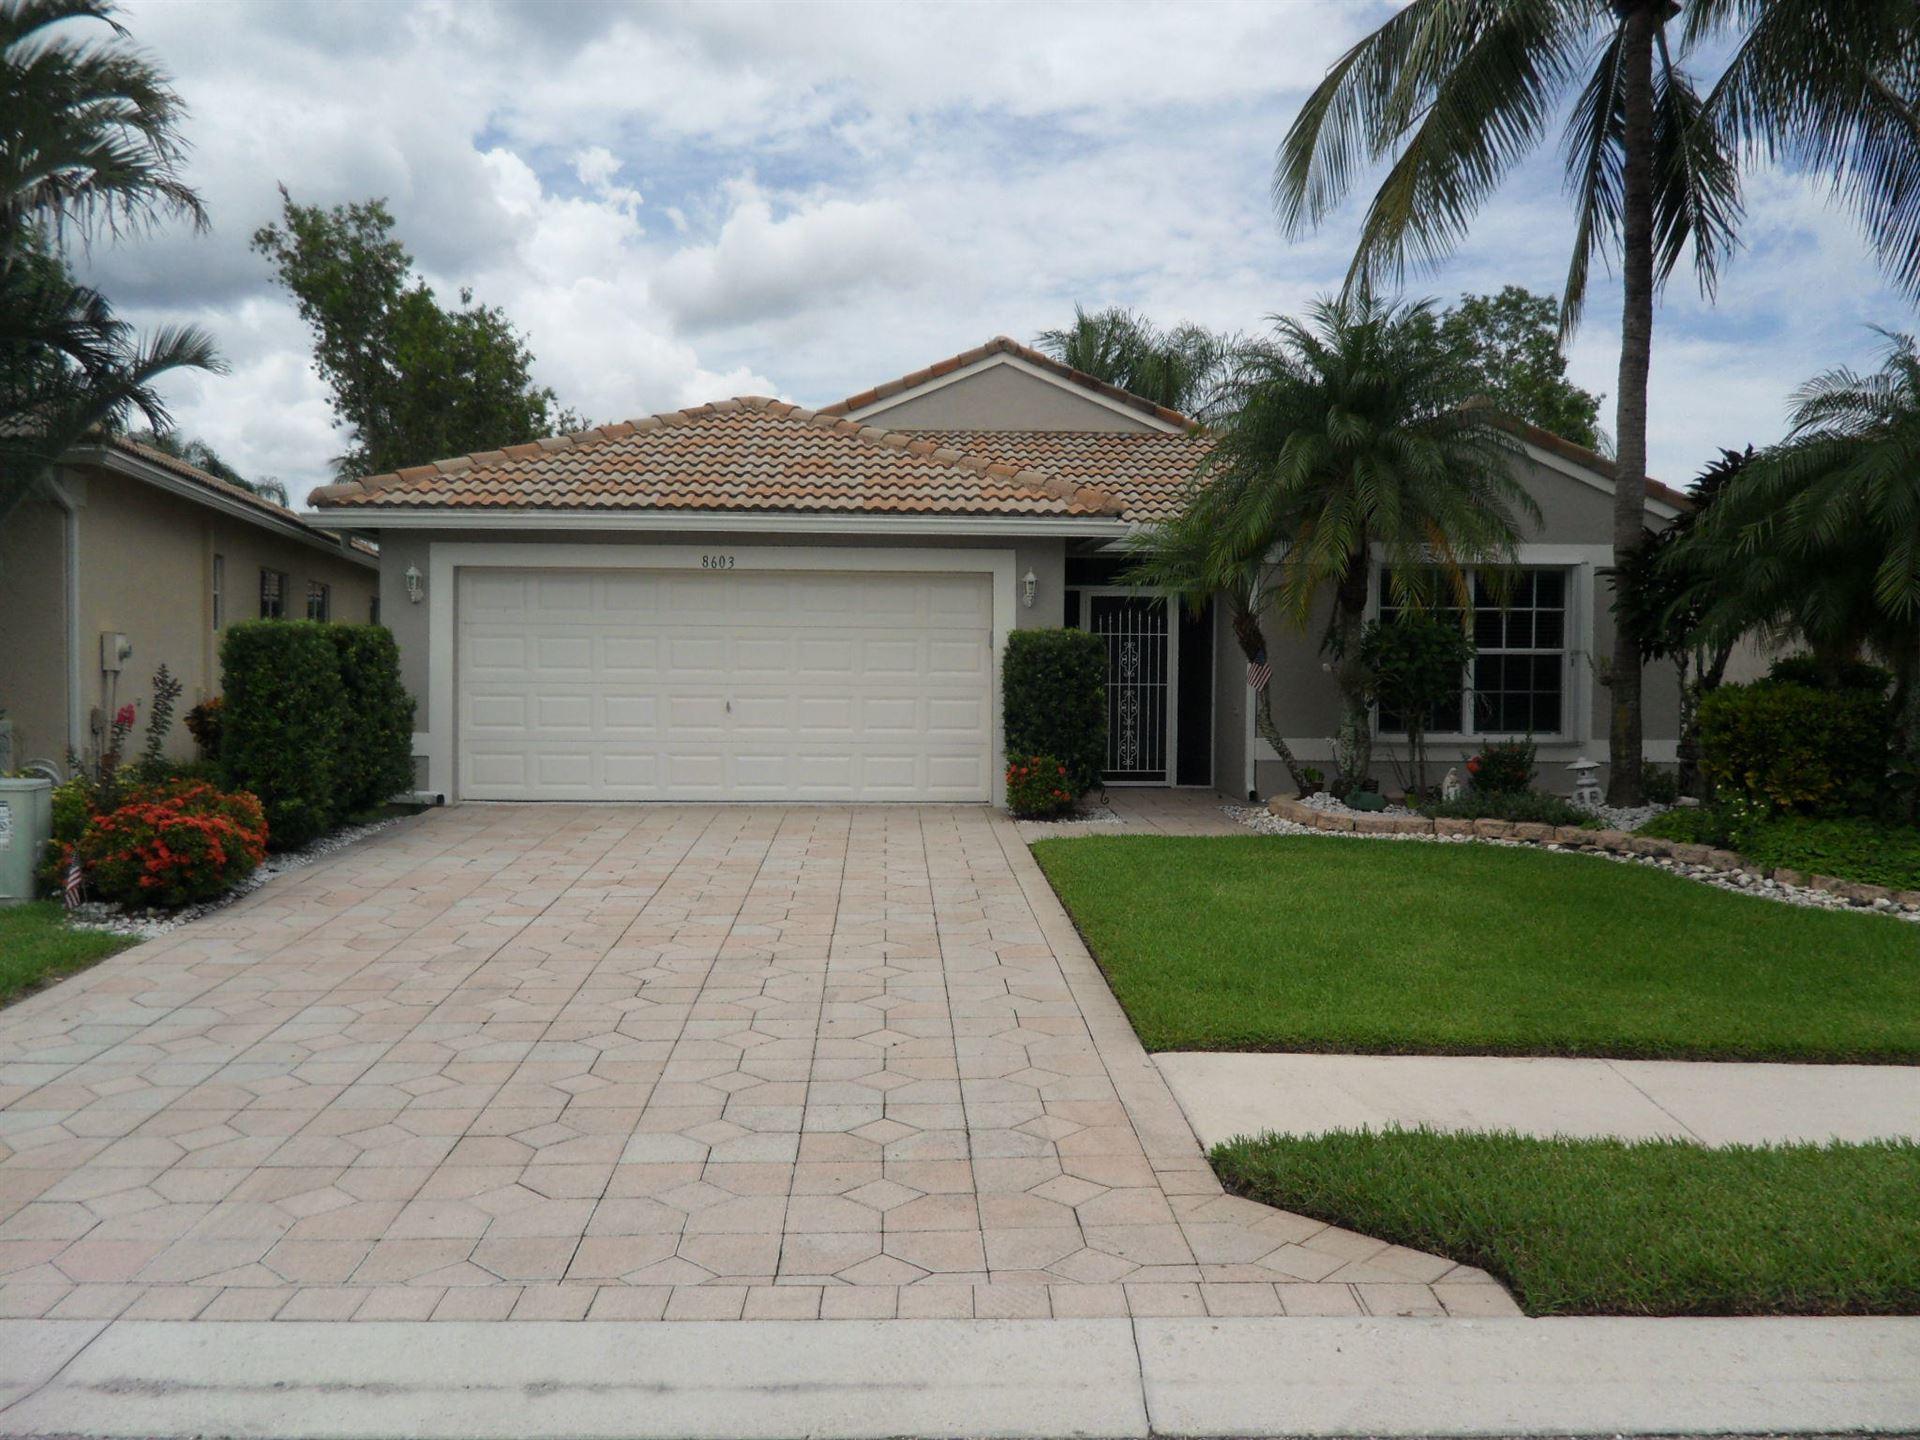 8603 San Andros, West Palm Beach, FL 33411 - #: RX-10633422